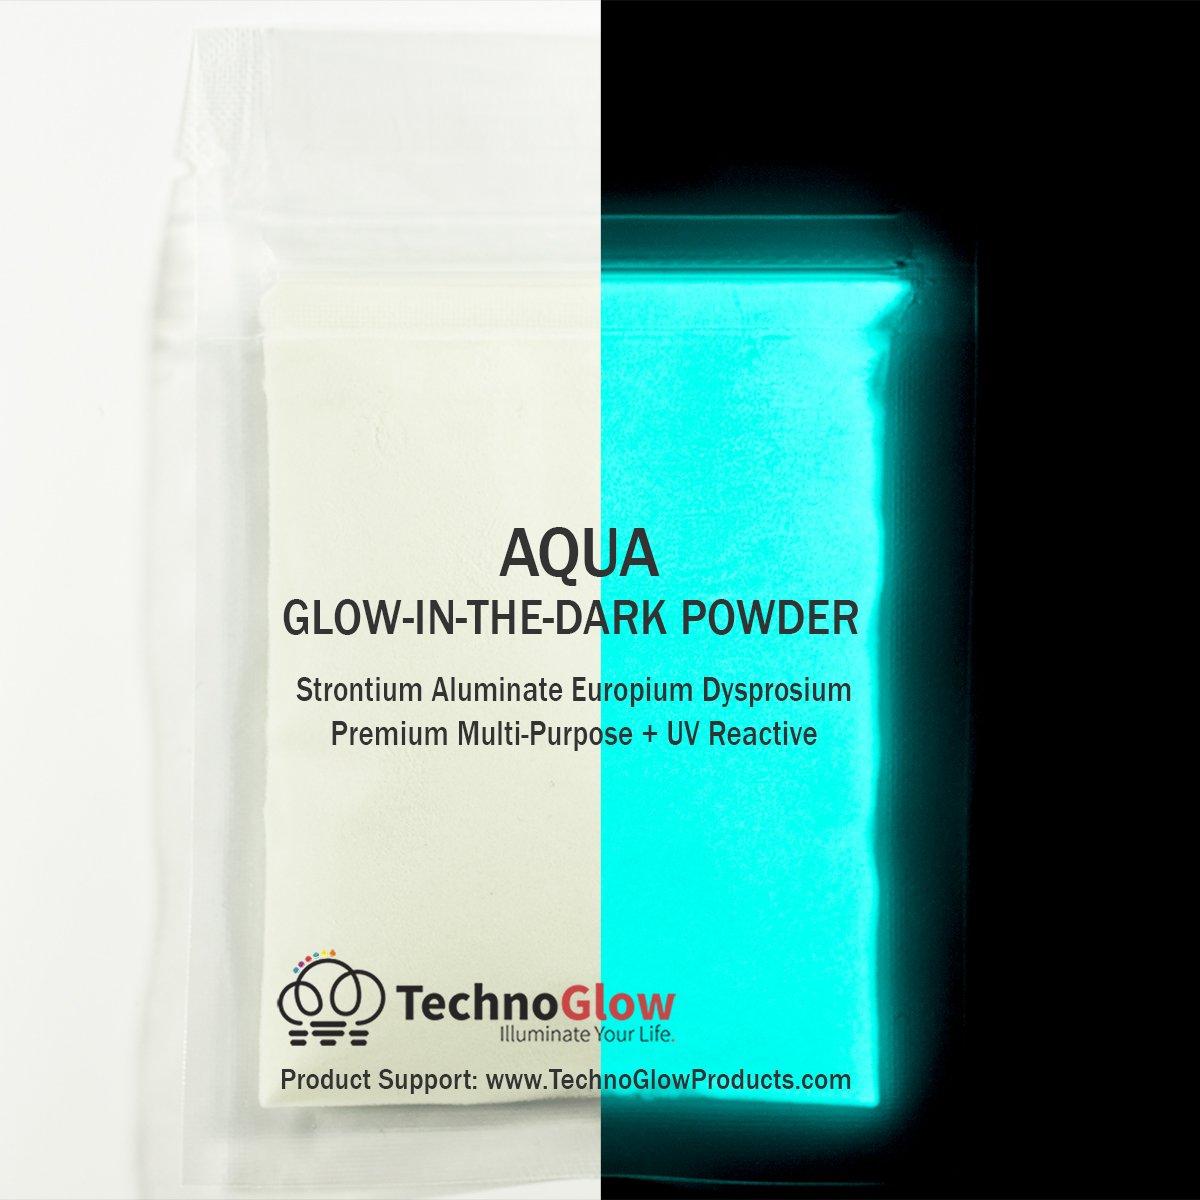 Aqua Glow in the Dark & UV Powder; 100-150 Microns (8 OZ) Techno Glow Inc P02-AQU-X